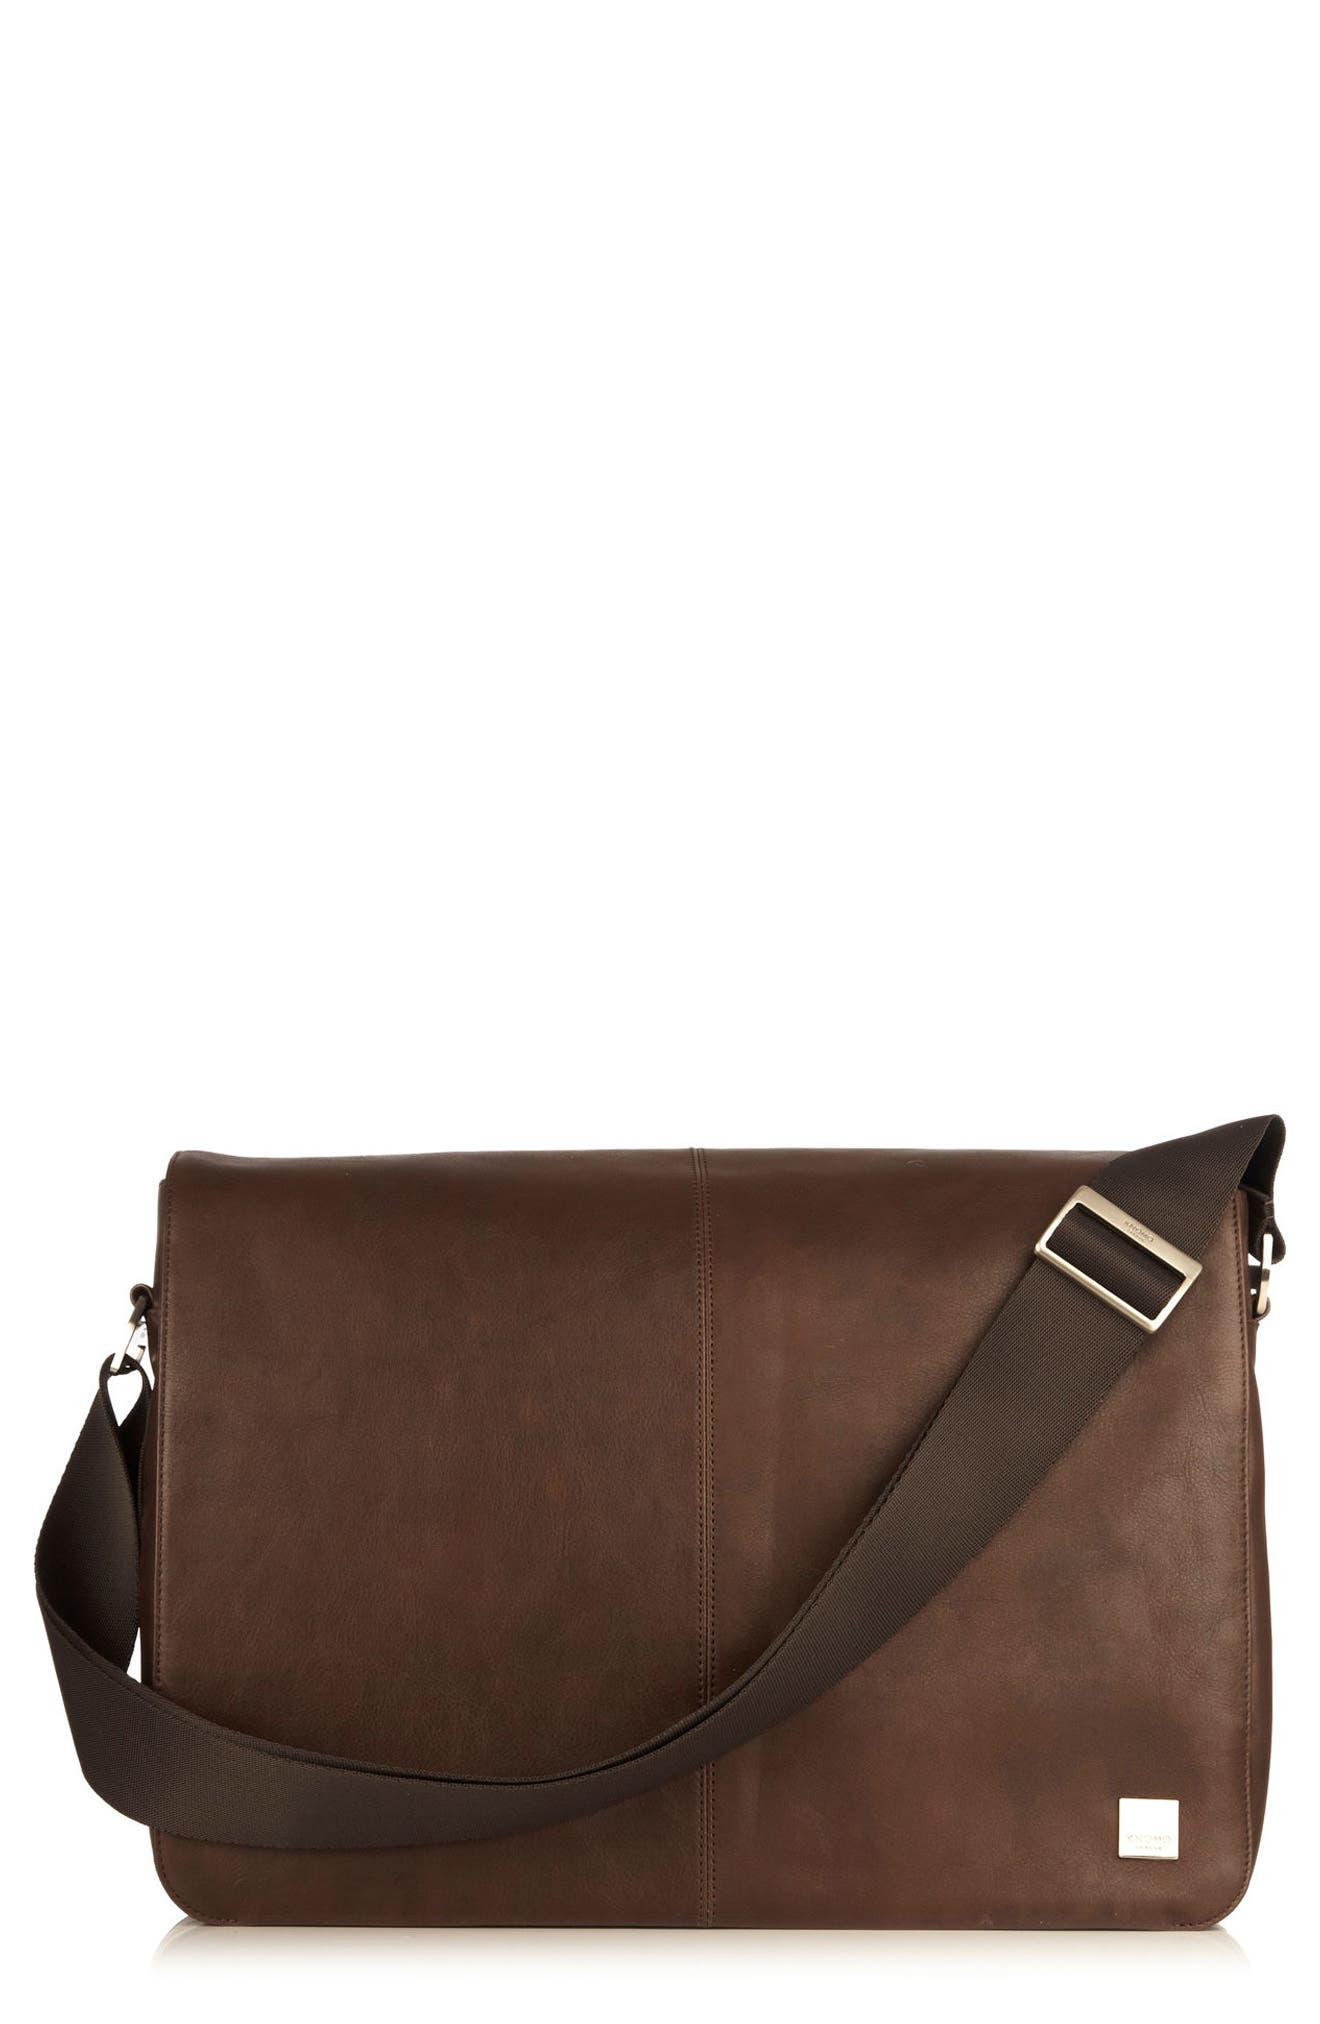 KNOMO London Brompton Bungo RFID Leather Messenger Bag